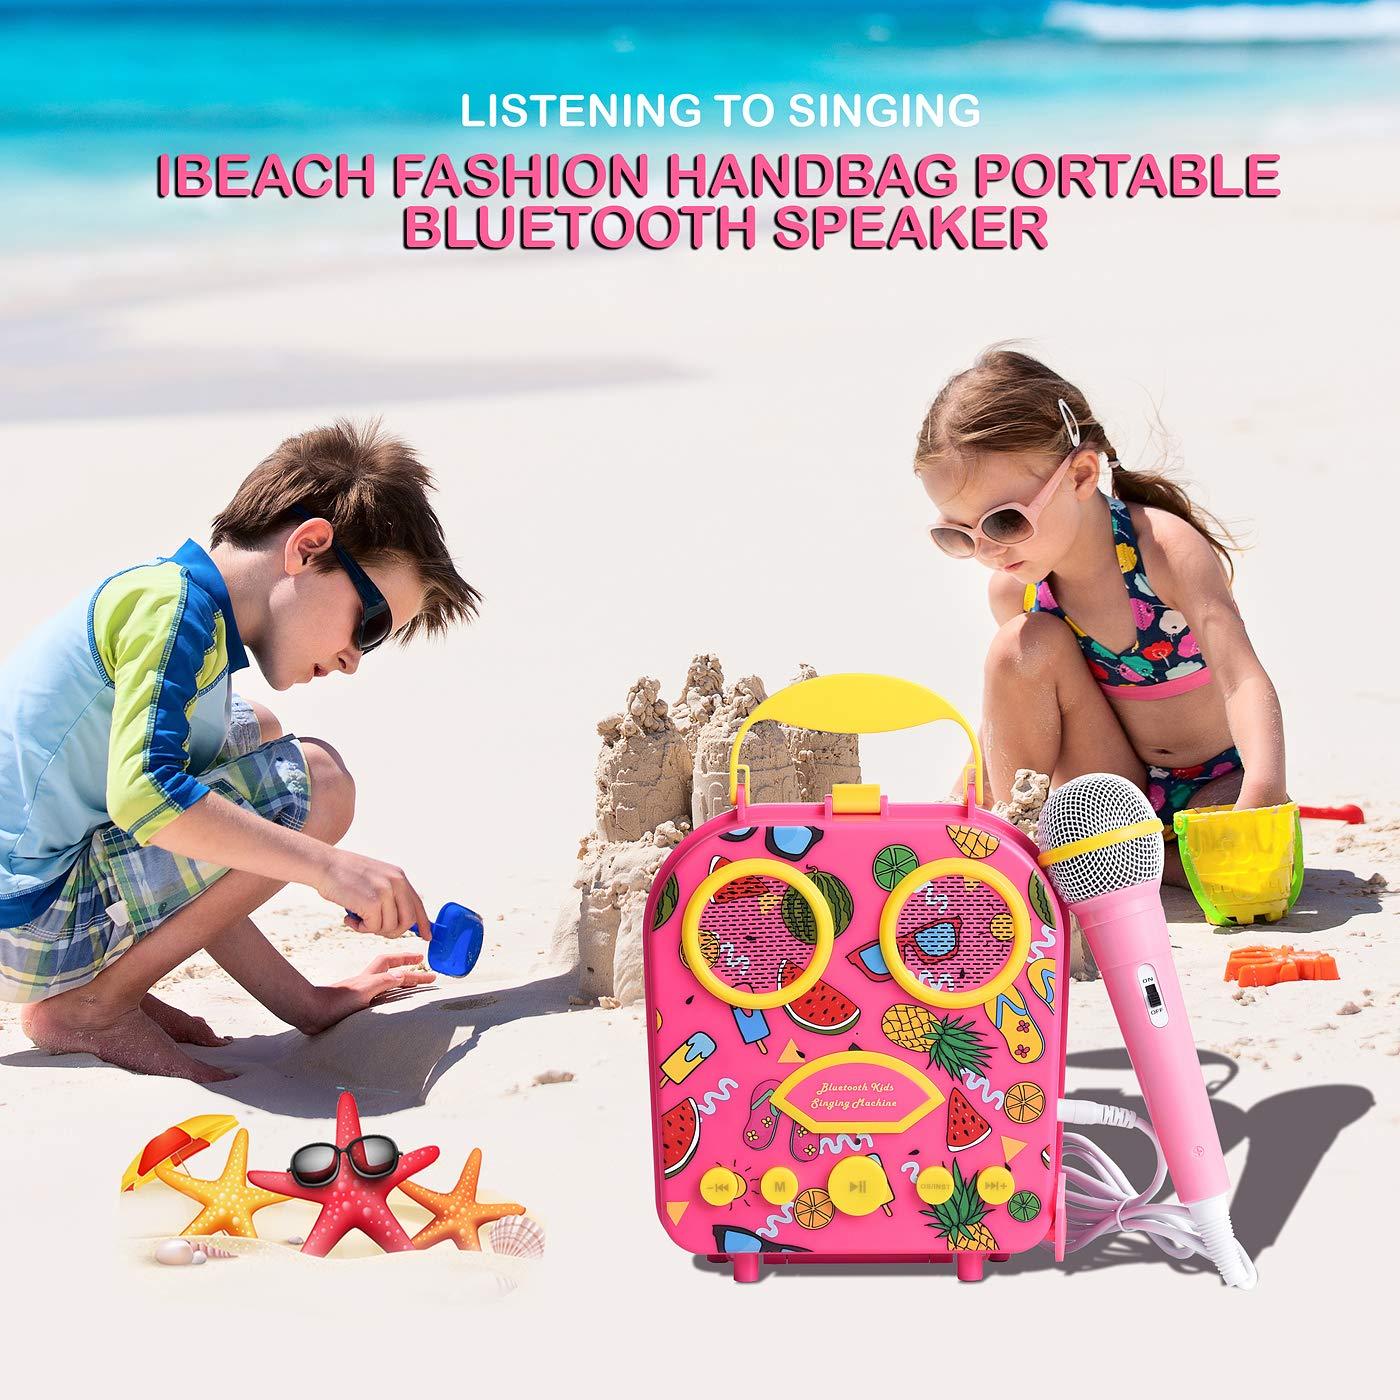 Bluetooth Speaker Children's Karaoke Speaker Portable Microphone Beach Handbag Karaoke Bluetooth Speaker Wireless Cartoon Speaker for Kids for Indoor Outdoor Travel Activities with Microphone (Pink) by HowQ (Image #9)